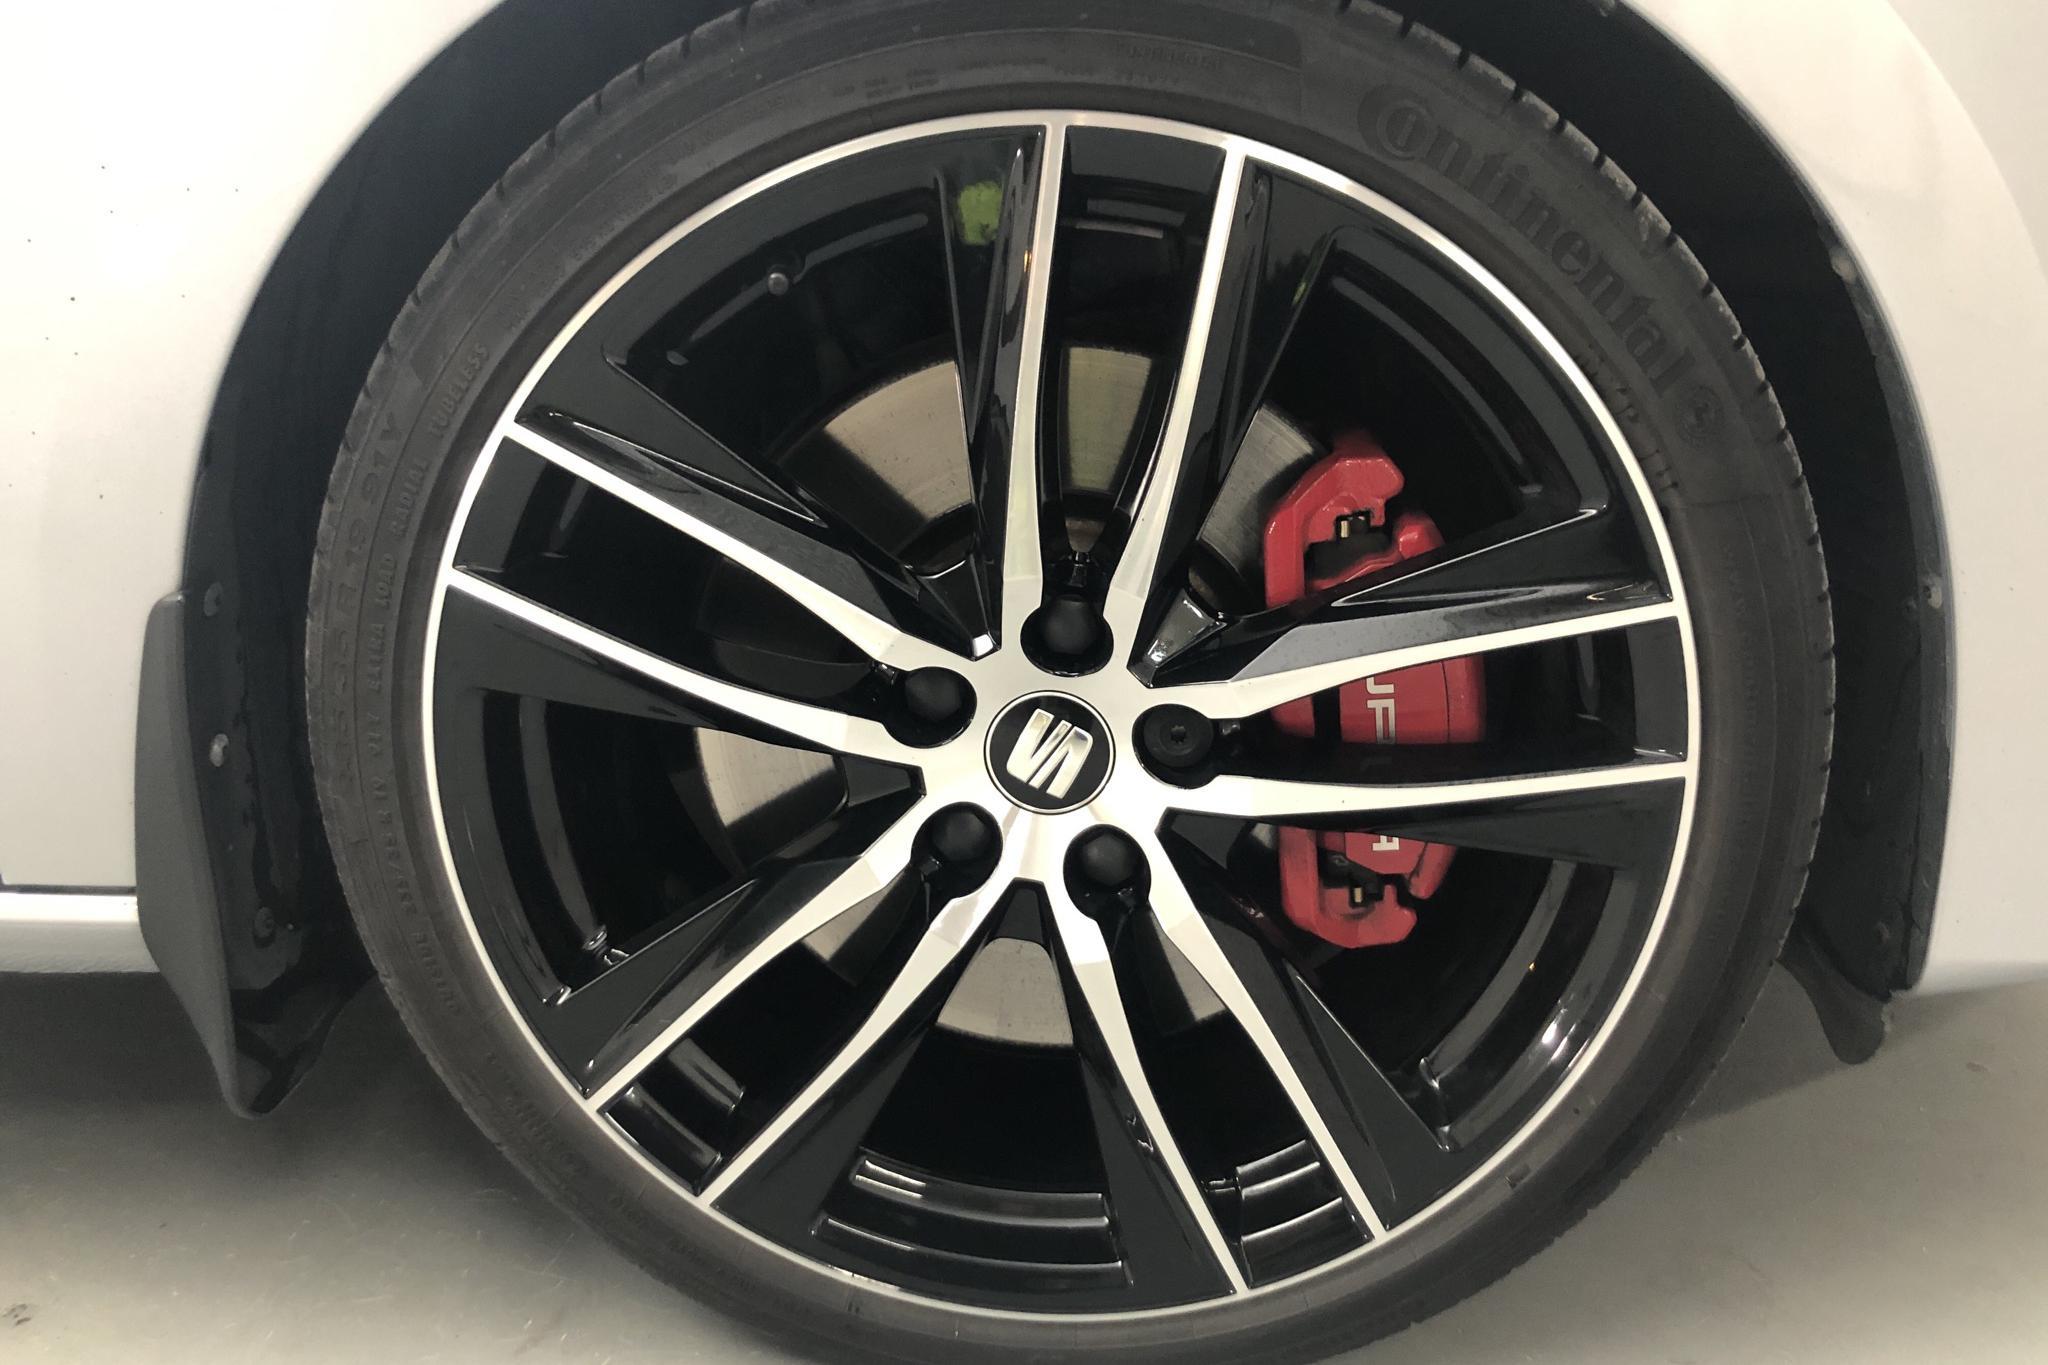 Seat Leon 2.0 TSI Cupra ST 4Drive (300hk) - 27 330 km - Automatic - silver - 2018